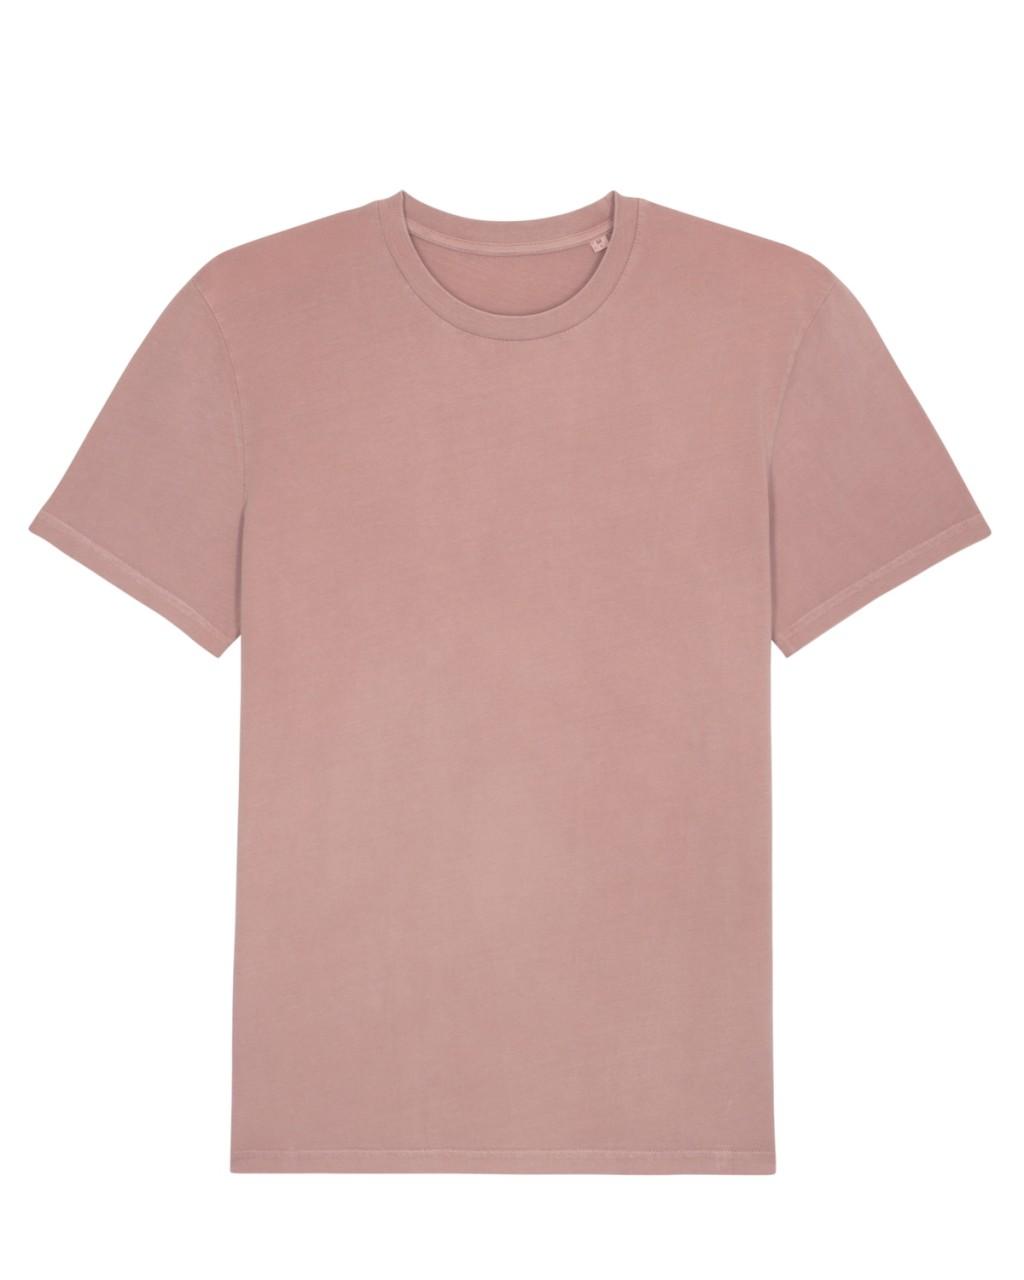 CREATOR vintage canyon pink